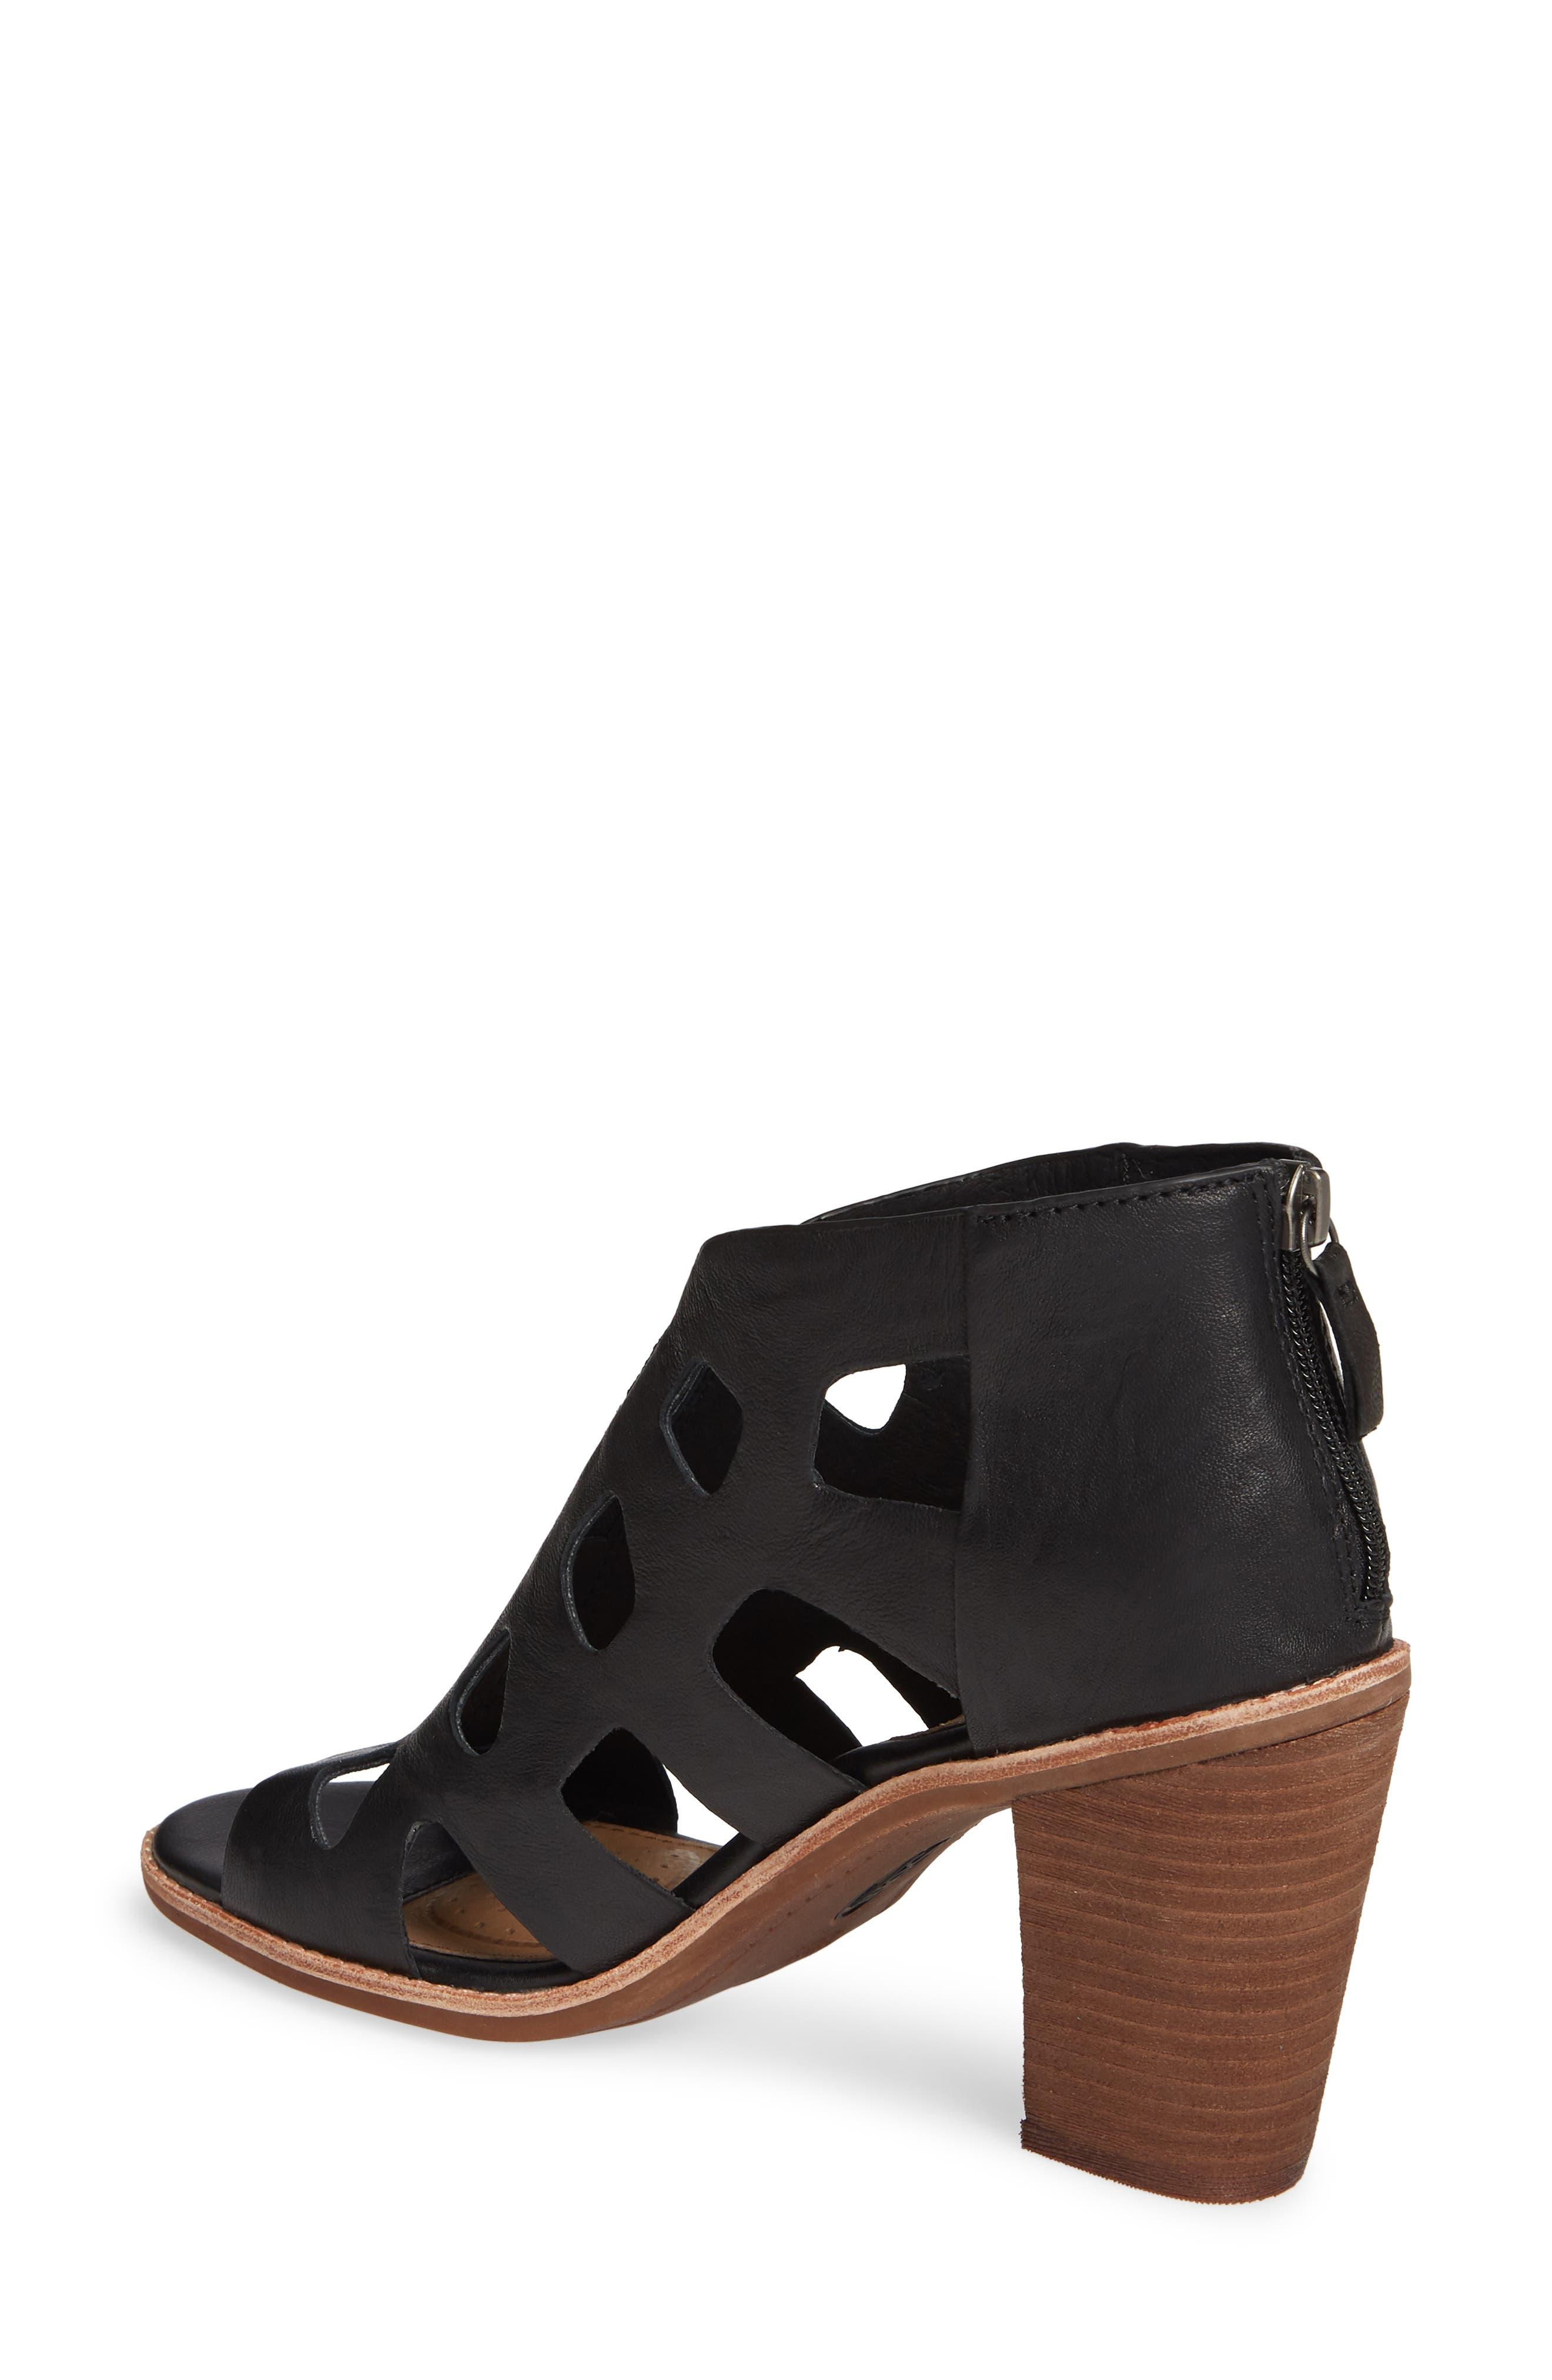 Pazia Block Heel Sandal,                             Alternate thumbnail 2, color,                             BLACK LEATHER